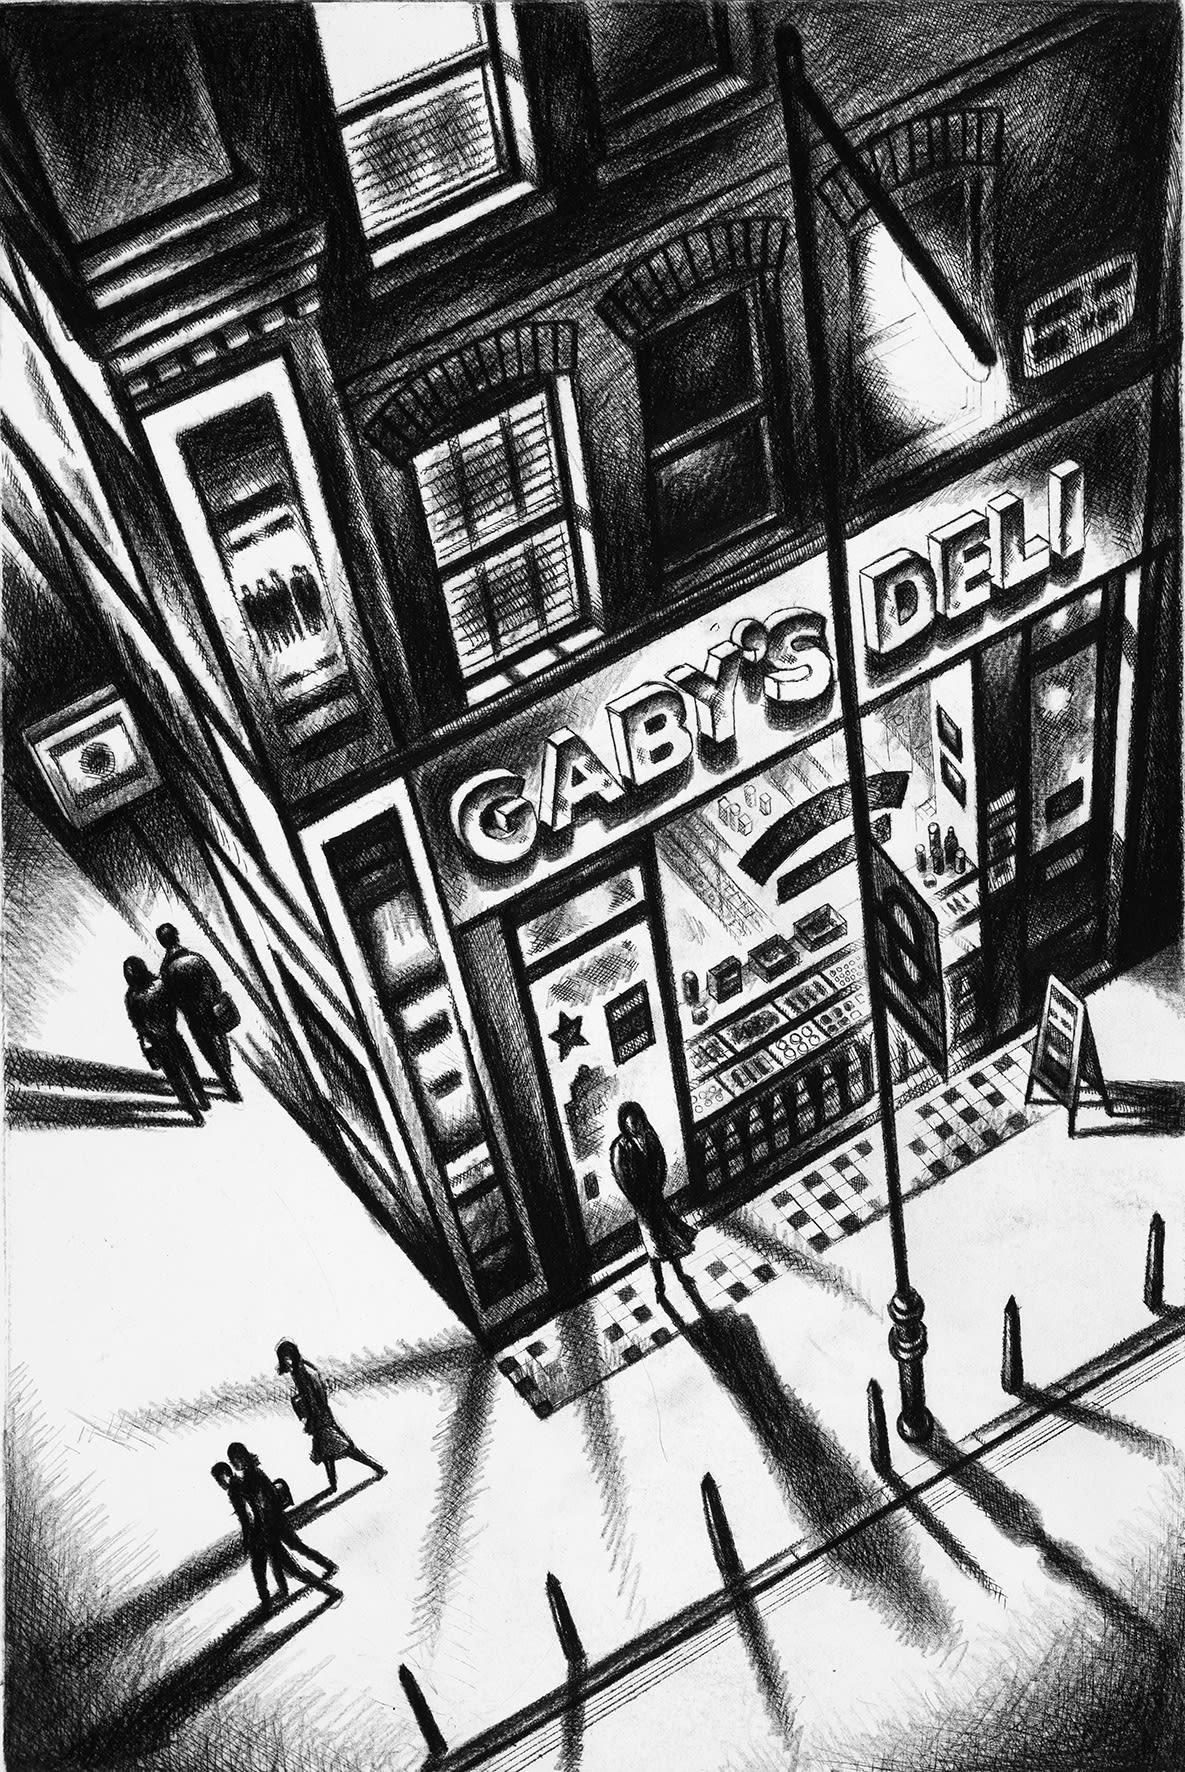 "<span class=""link fancybox-details-link""><a href=""/exhibitions/20/works/artworks_standalone10811/"">View Detail Page</a></span><div class=""artist""><span class=""artist""><strong>John Duffin RE</strong></span></div><div class=""title""><em>Gaby's Deli - Covent Garden</em></div><div class=""medium"">etching</div><div class=""dimensions"">38 x 25 cm image size<br></div><div class=""edition_details"">edition of 150</div>"